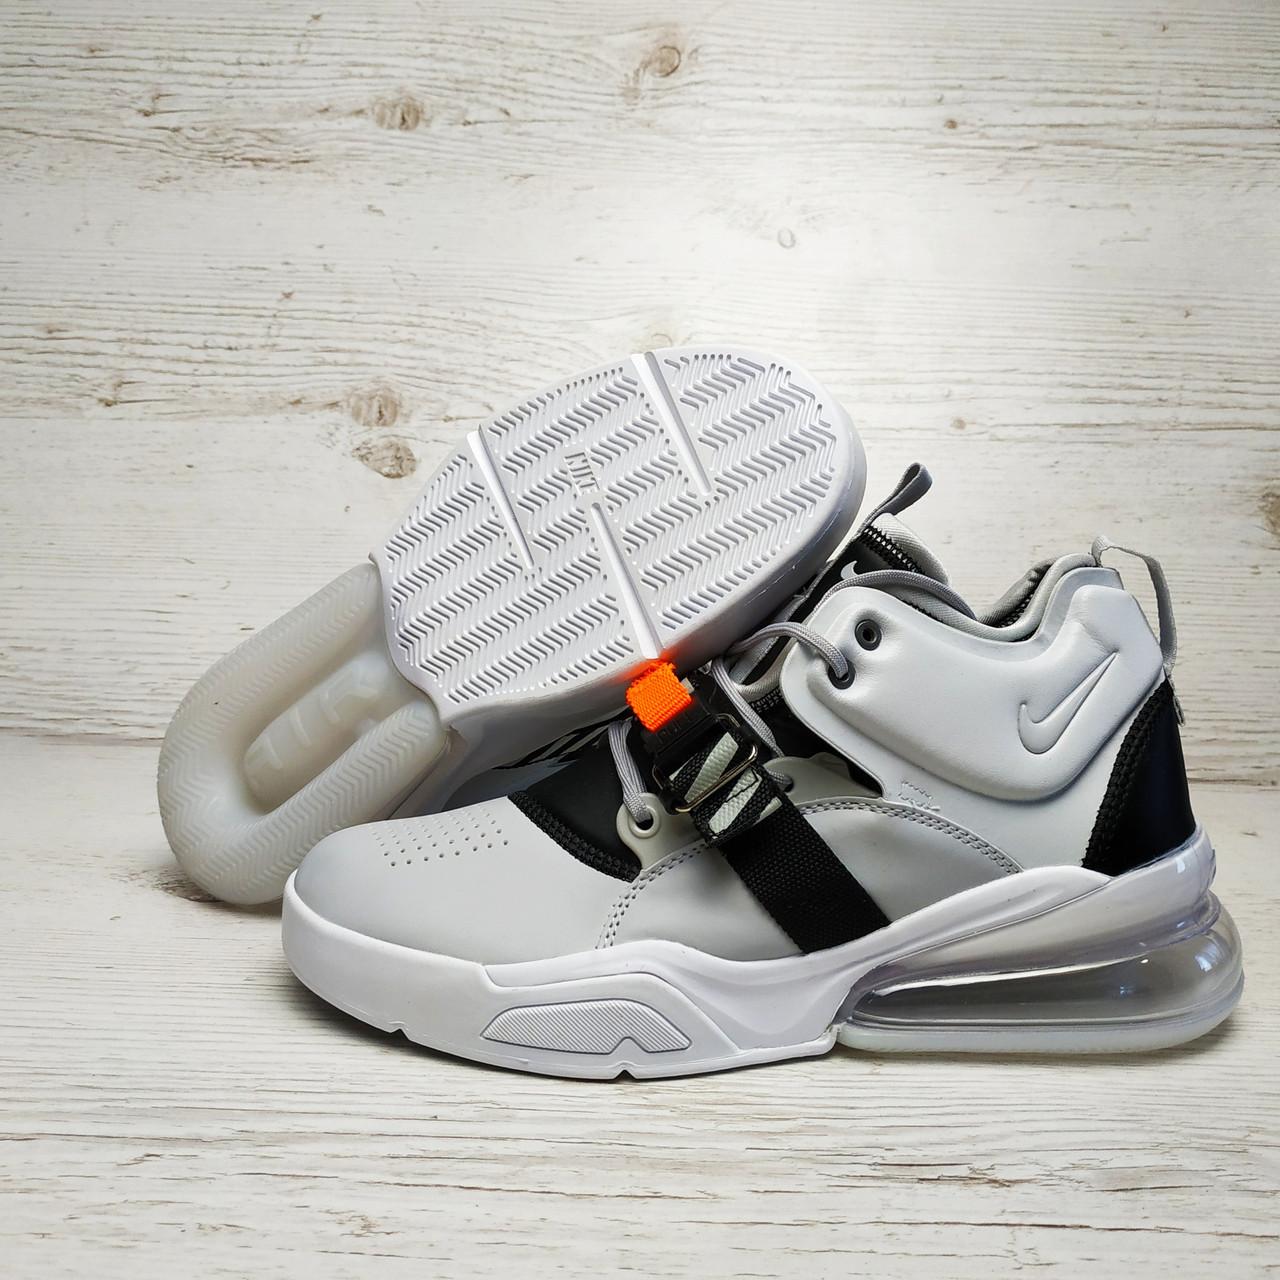 Мужские кроссовки Nike Air Force 270 (ТОП РЕПЛИКА ААА+), фото 1